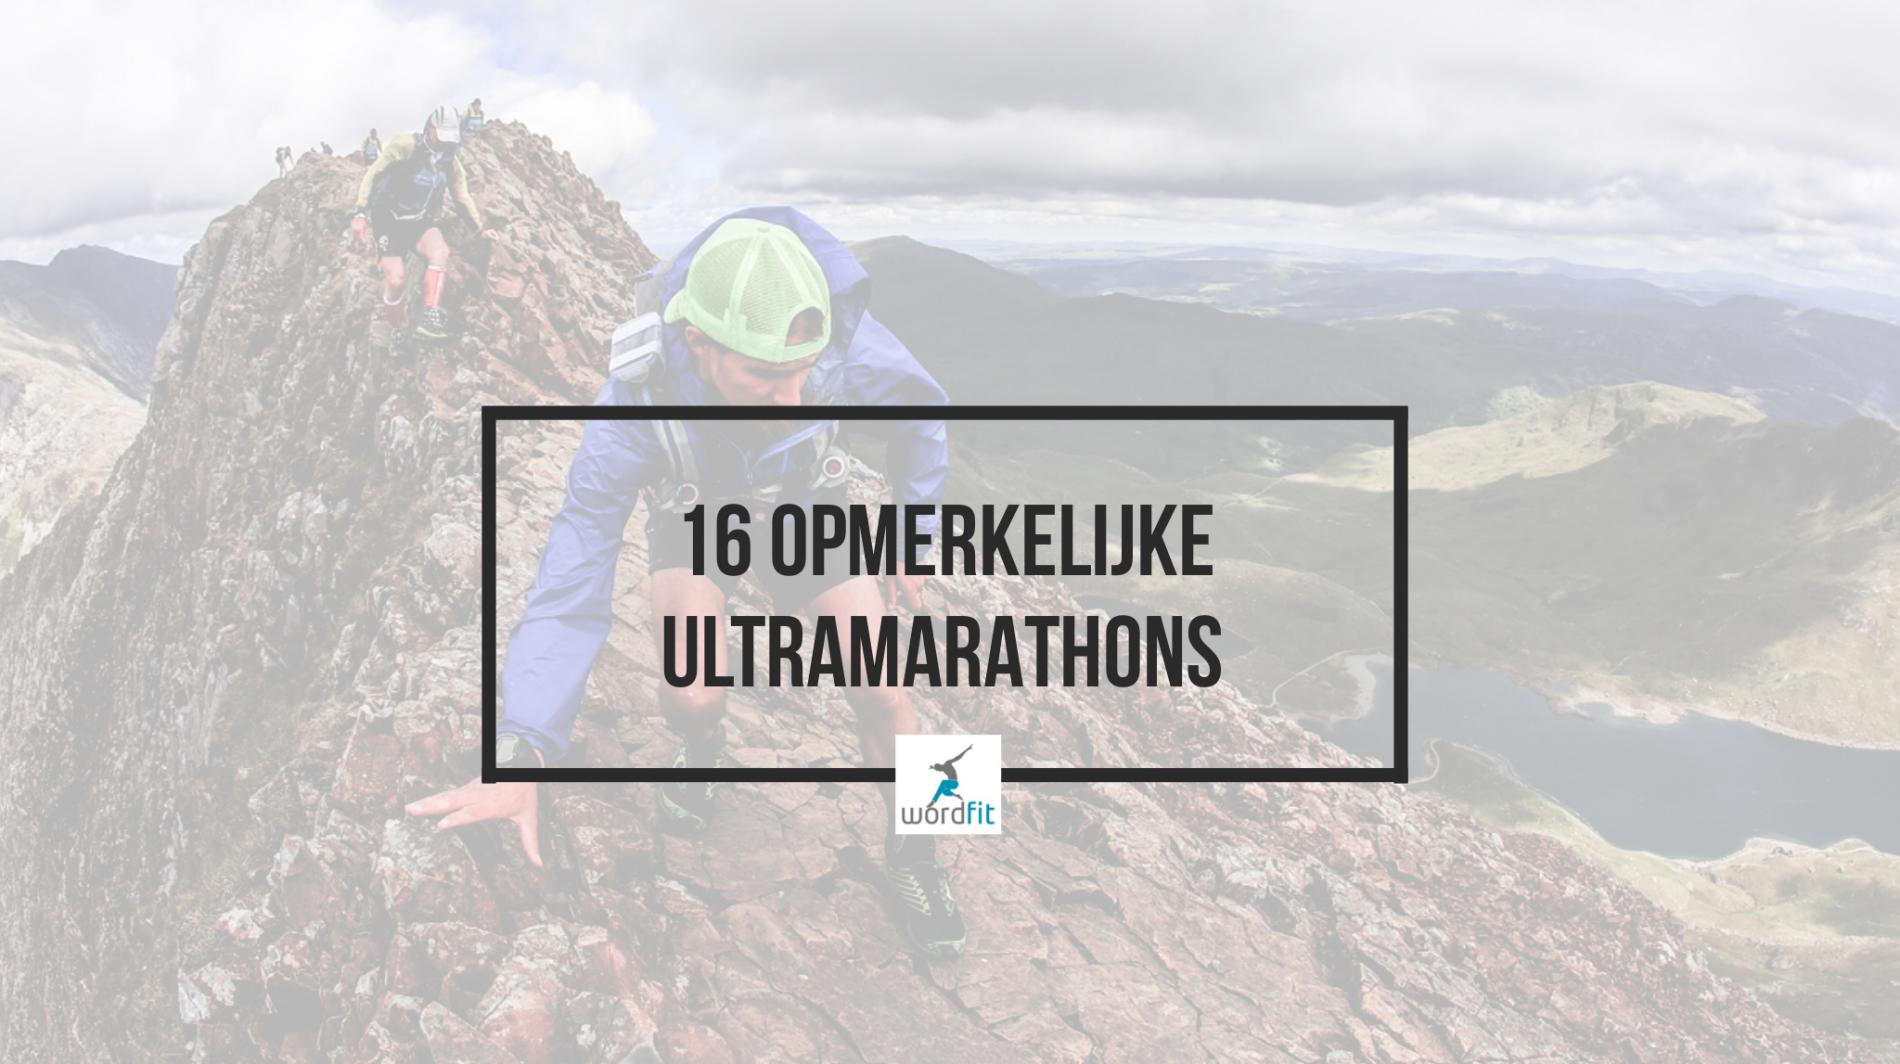 Extreme ultramarathons WordFit.be